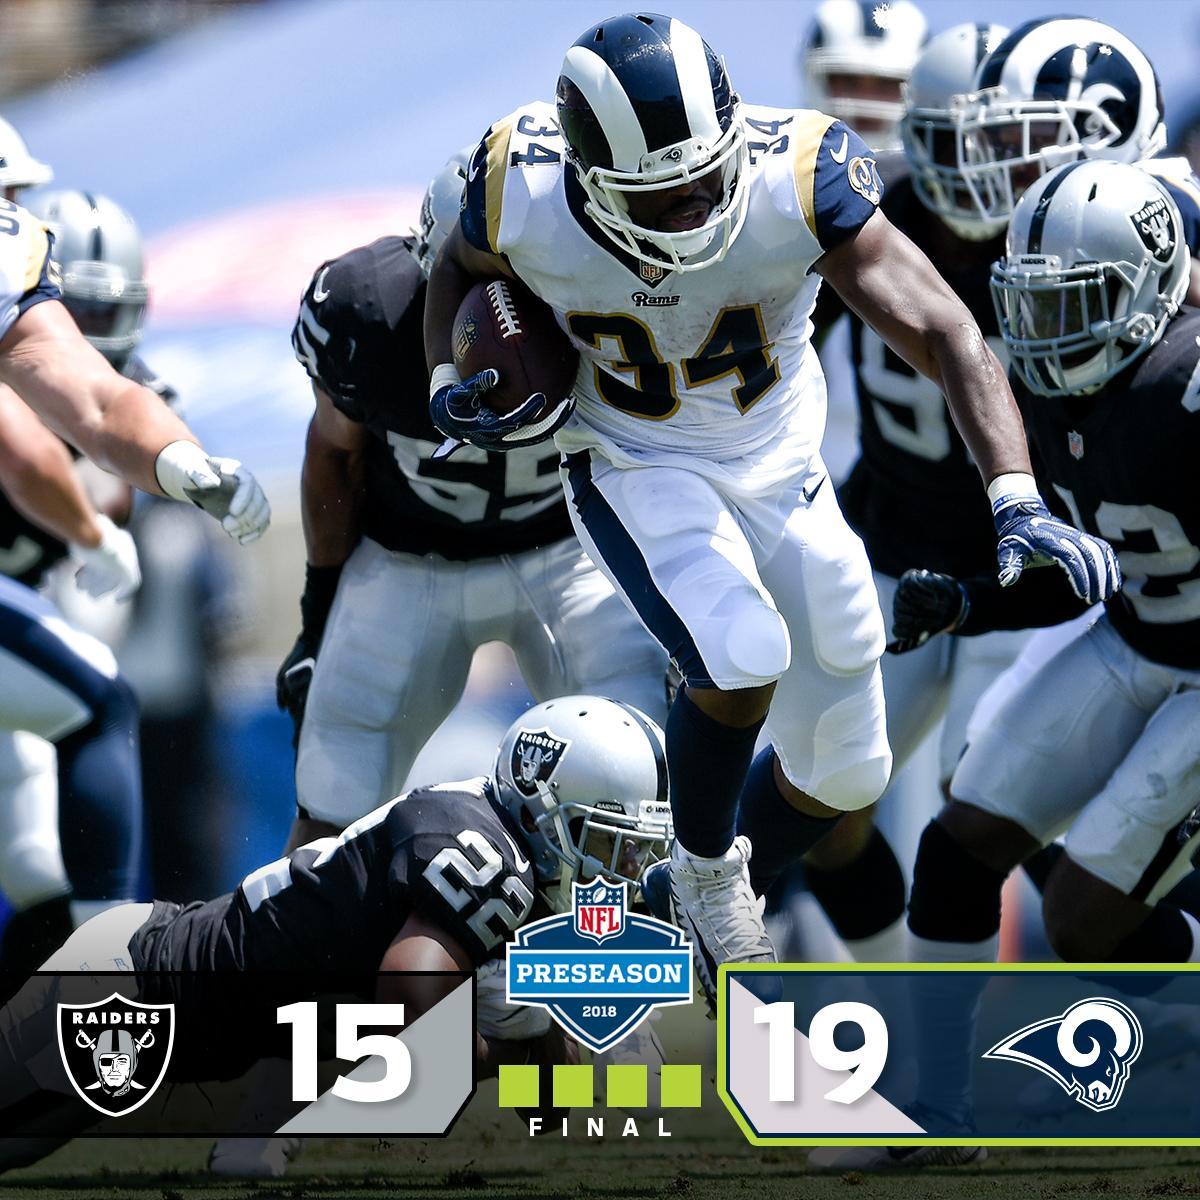 FINAL: The @RamsNFL get a W!  #OAKvsLAR #NFLPreseason https://t.co/y8xSCREY3p